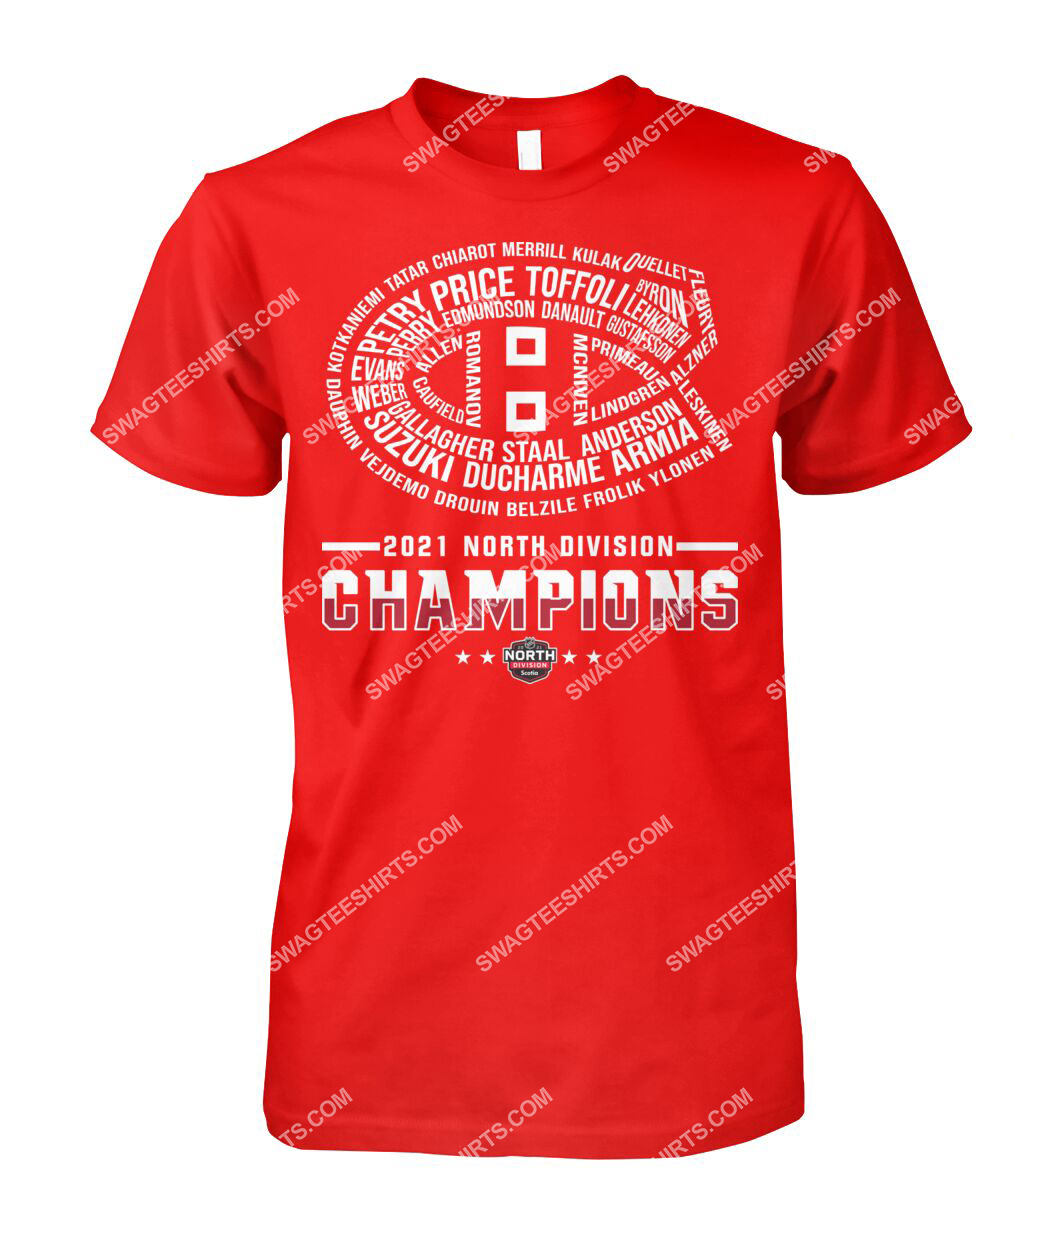 montreal canadiens 2021 north division champions tshirt 1